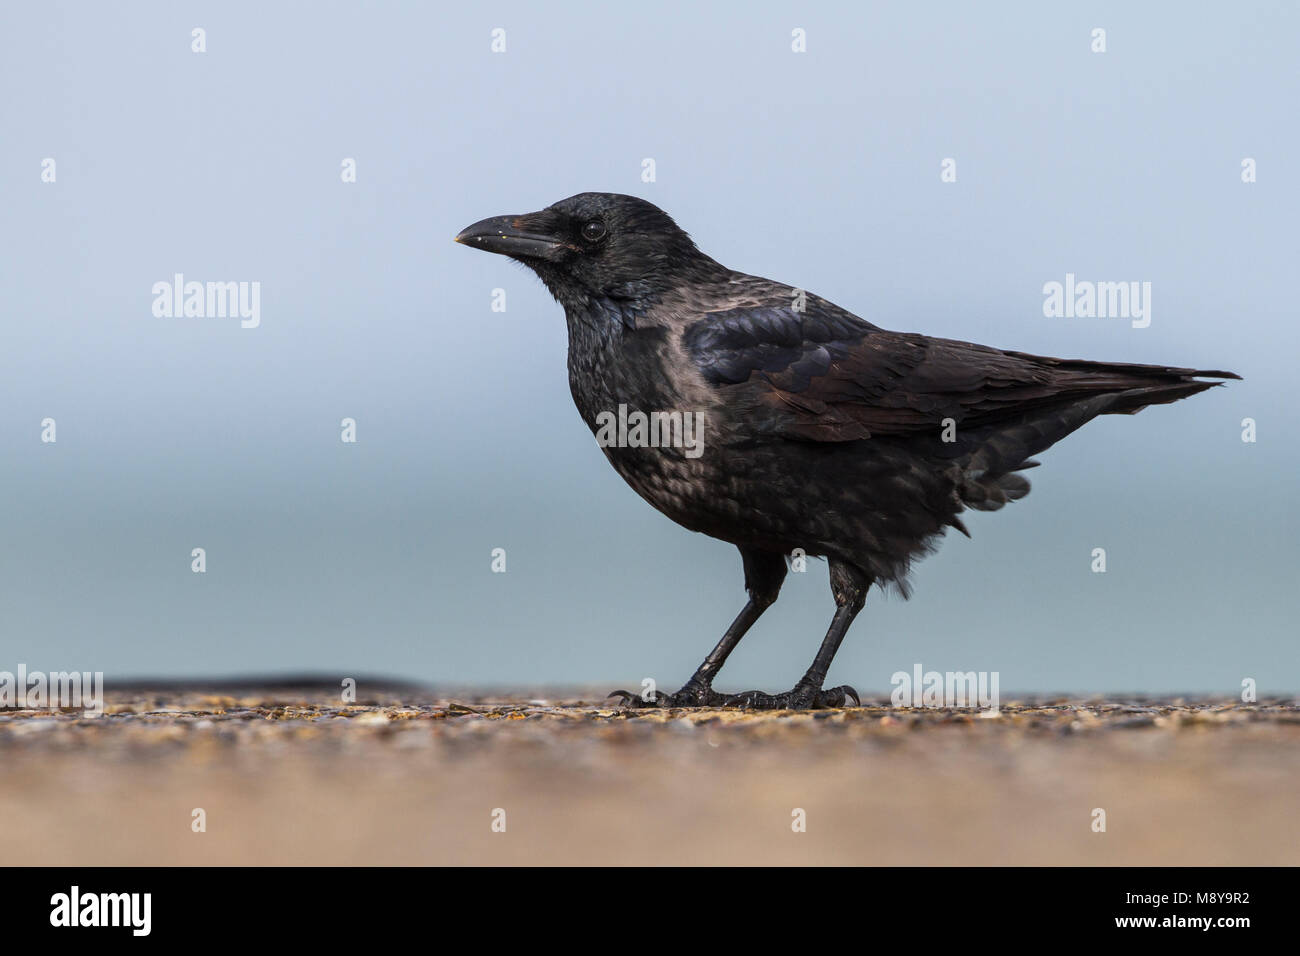 Hybride Bonte Kraai x Zwarte Kraai, Hybrid Hooded Crow x Carrion Crow, Corvus cornix x corone Stock Photo